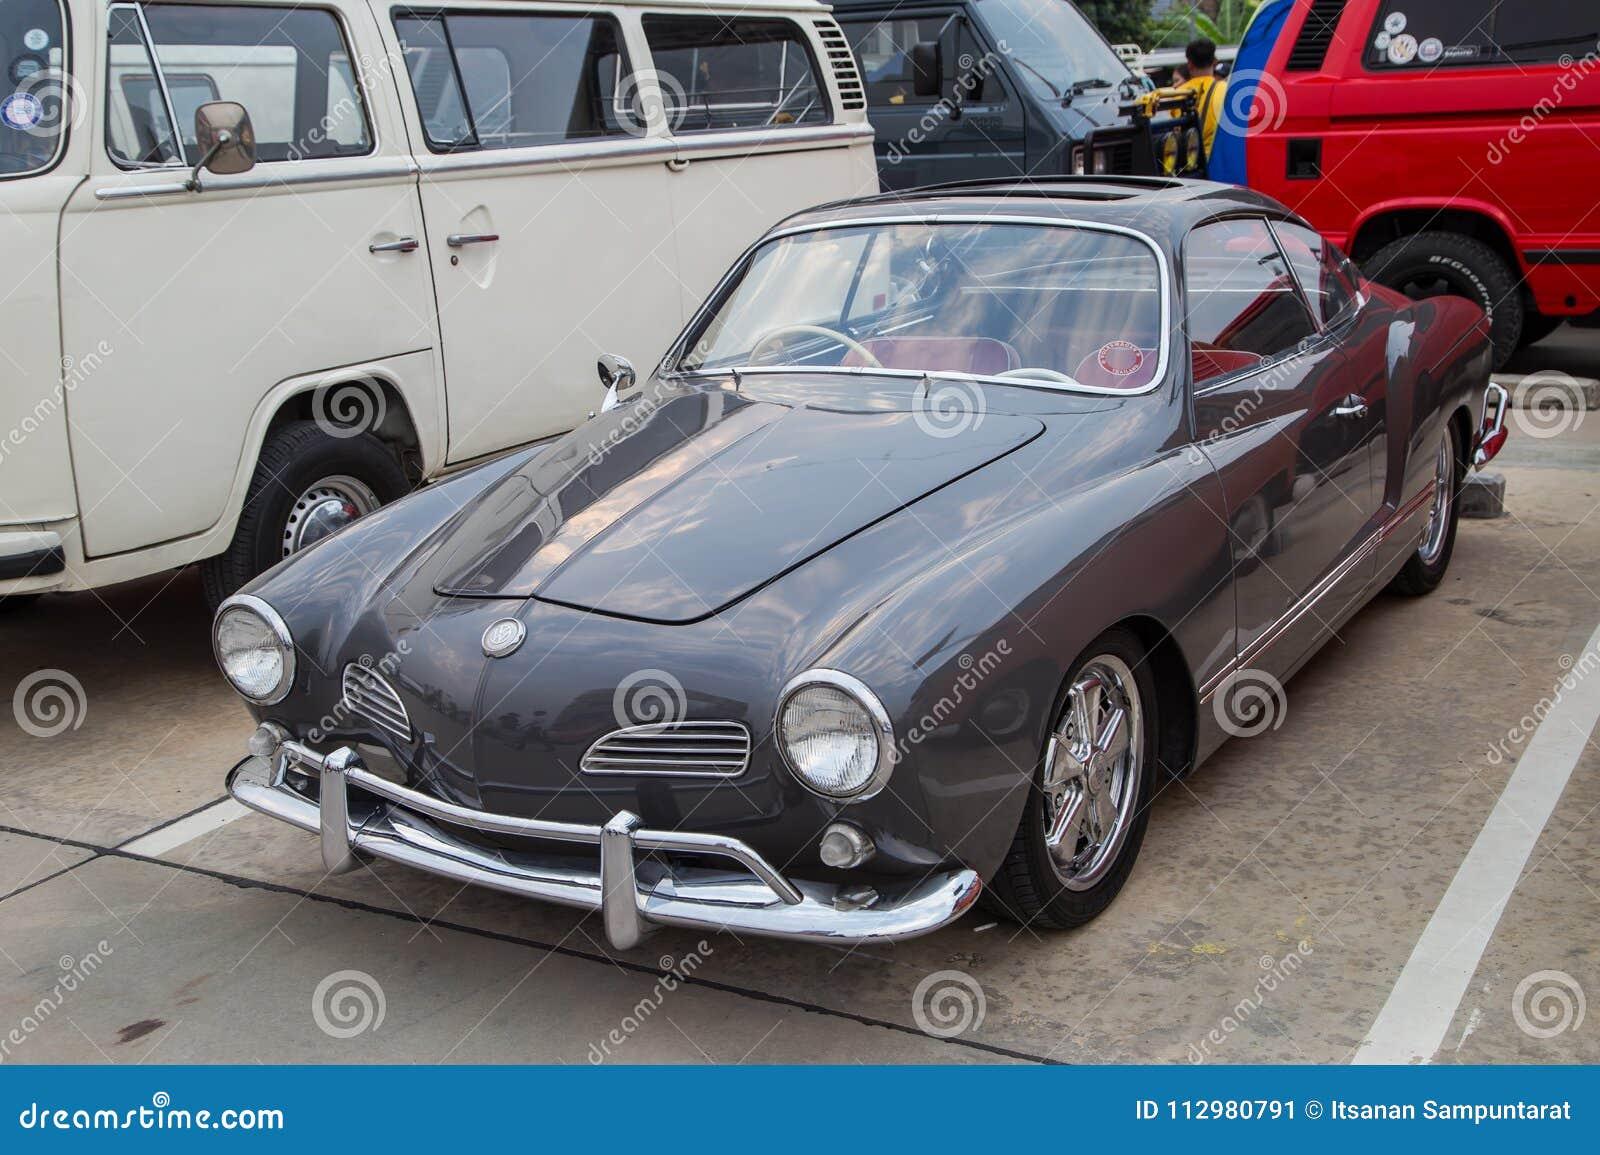 Volkswagen Karmann Ghia show in VW club meeting